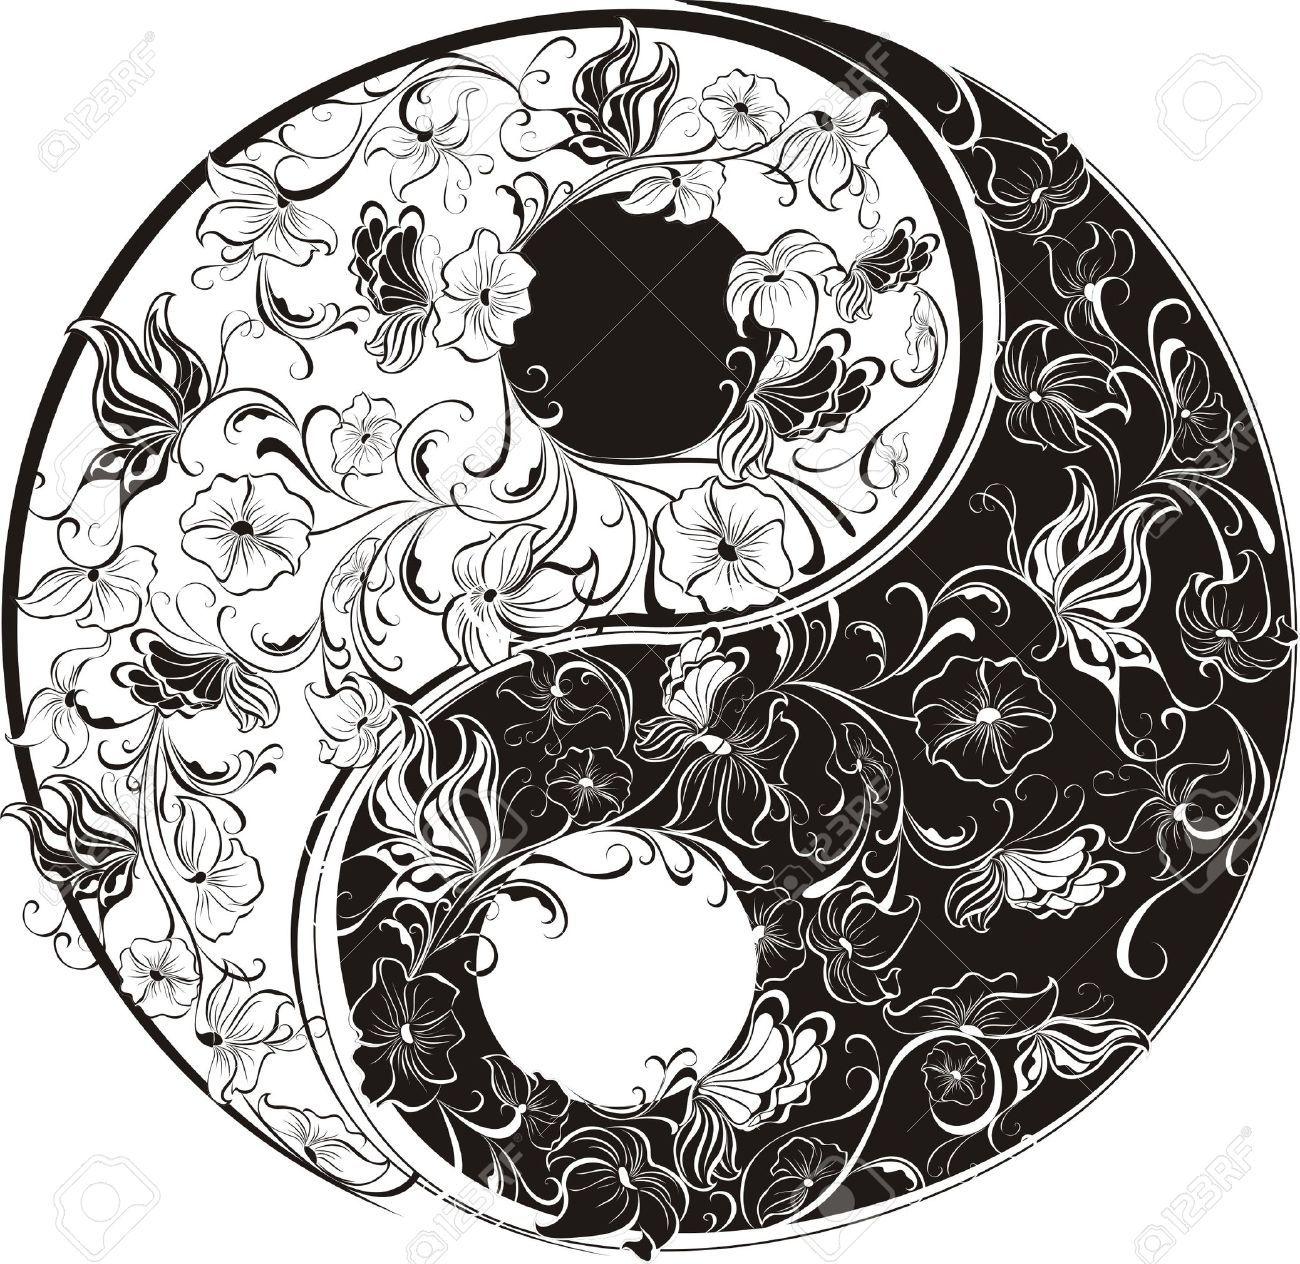 Taoism Symbols Dragon: Yin And Yang Stock Photos Images. 9,671 Royalty Free Yin